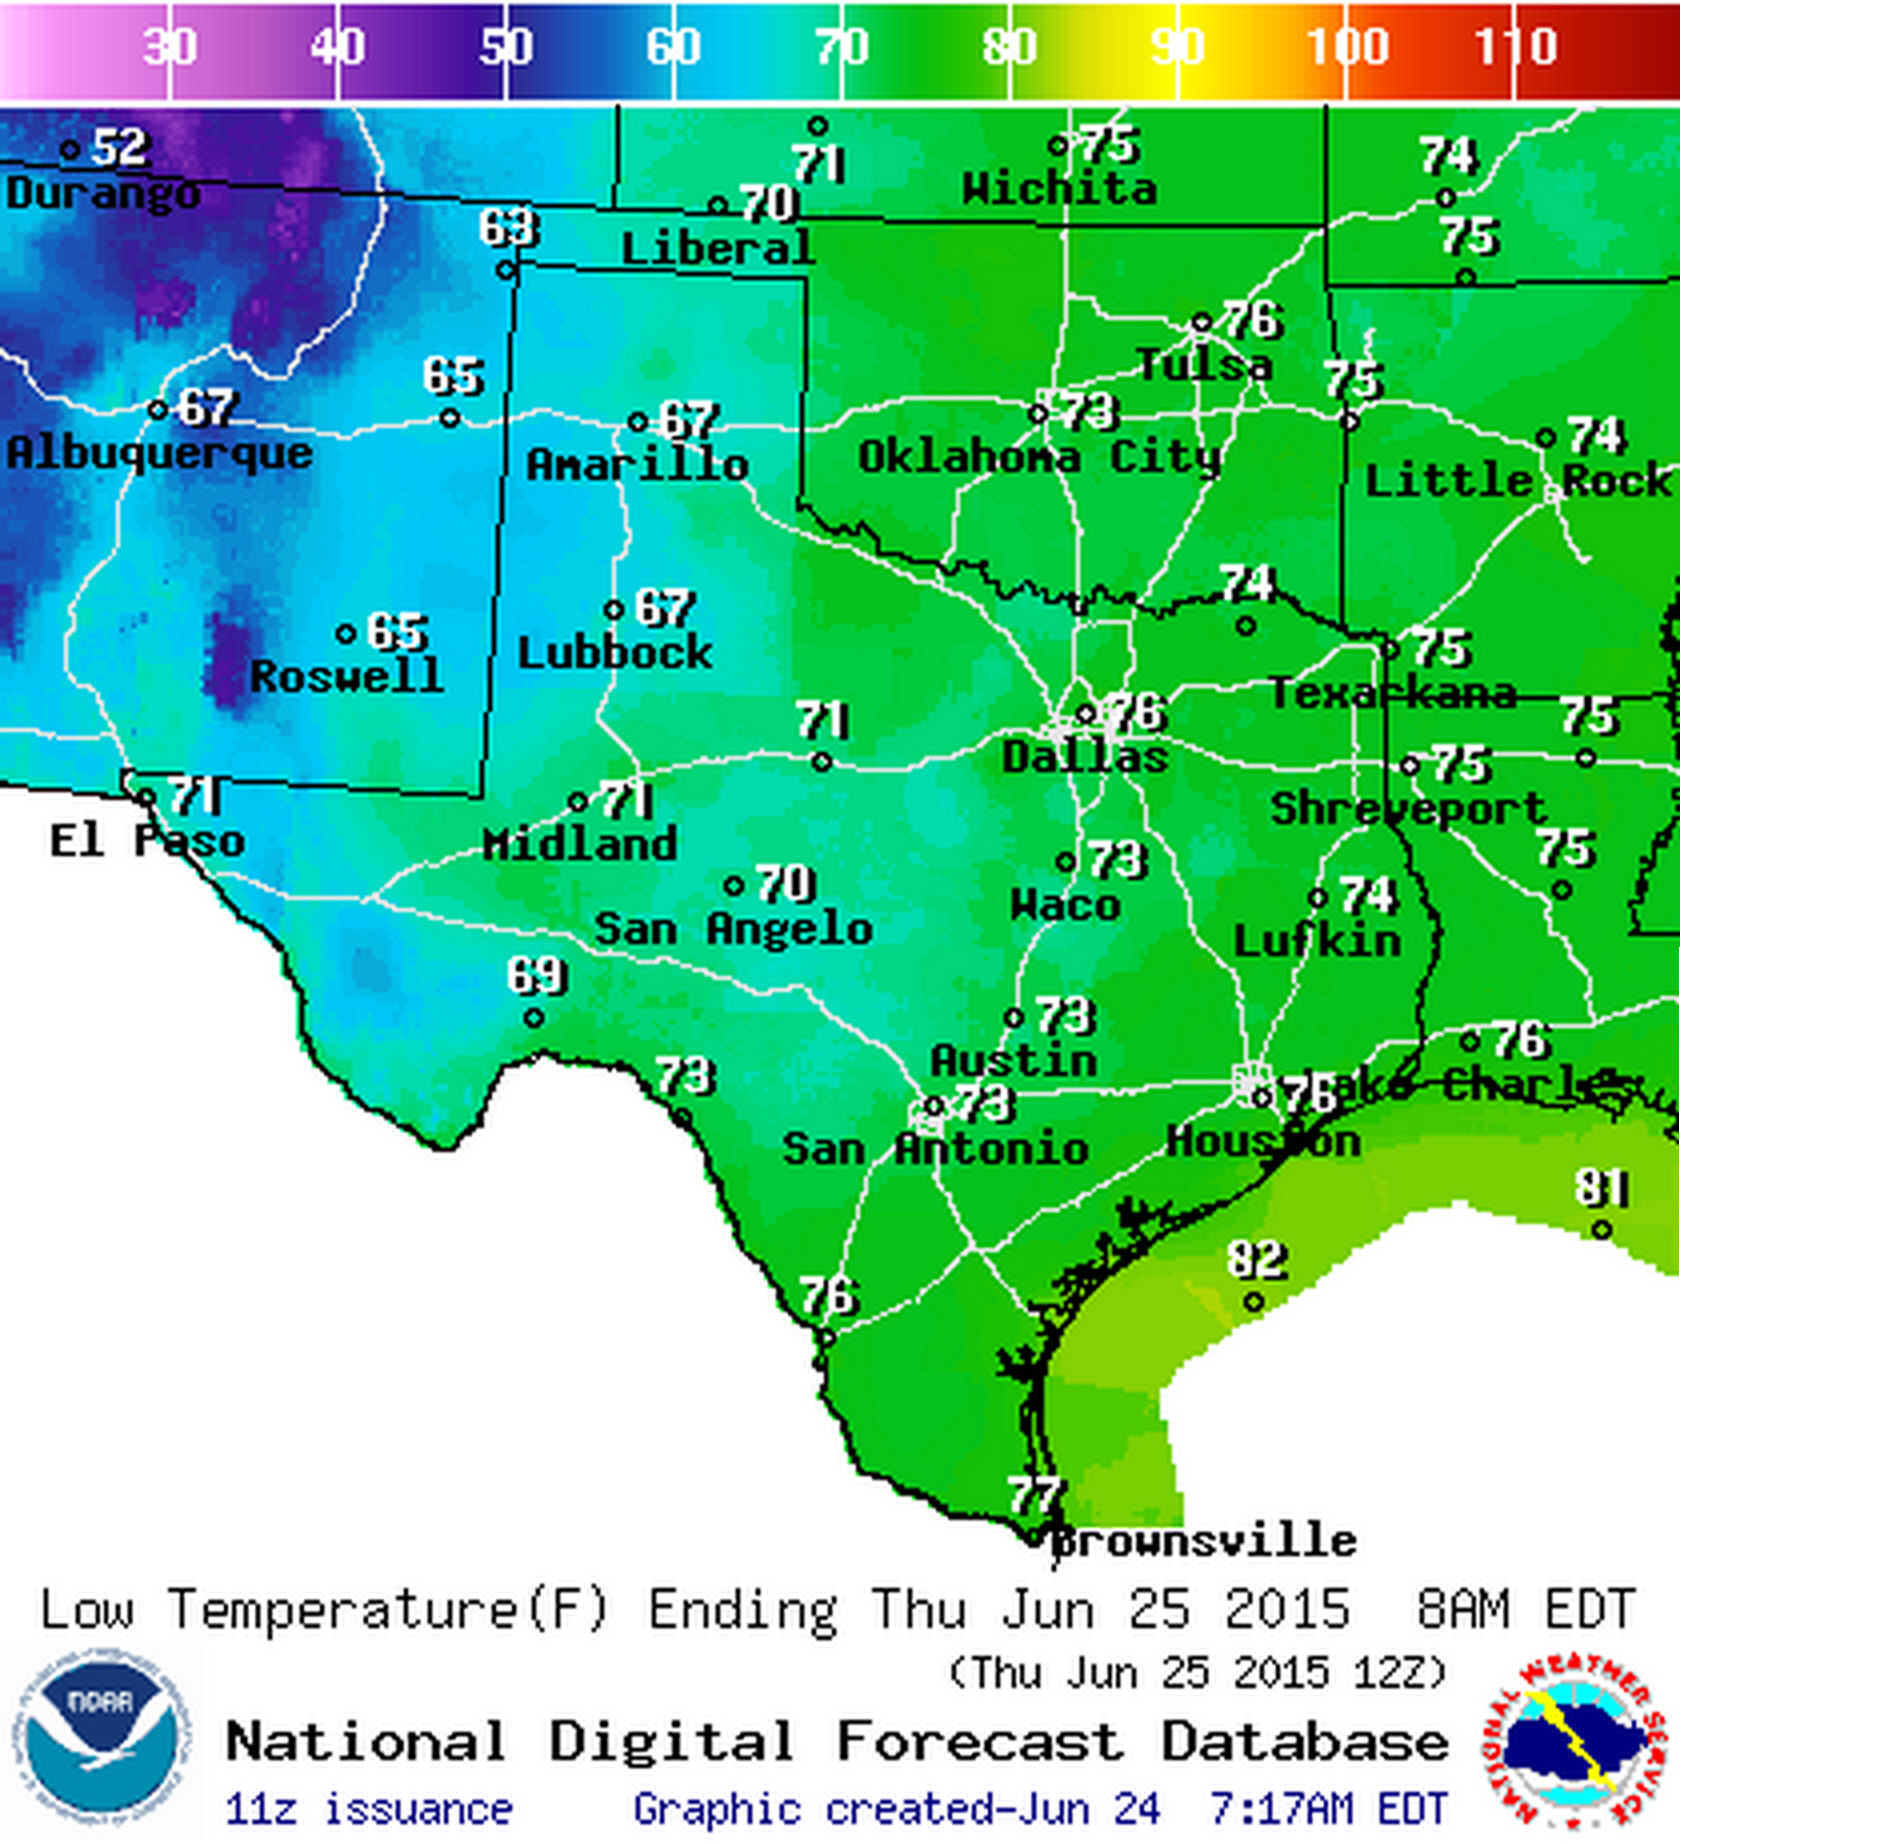 Wednesday Night's low temperature forecast